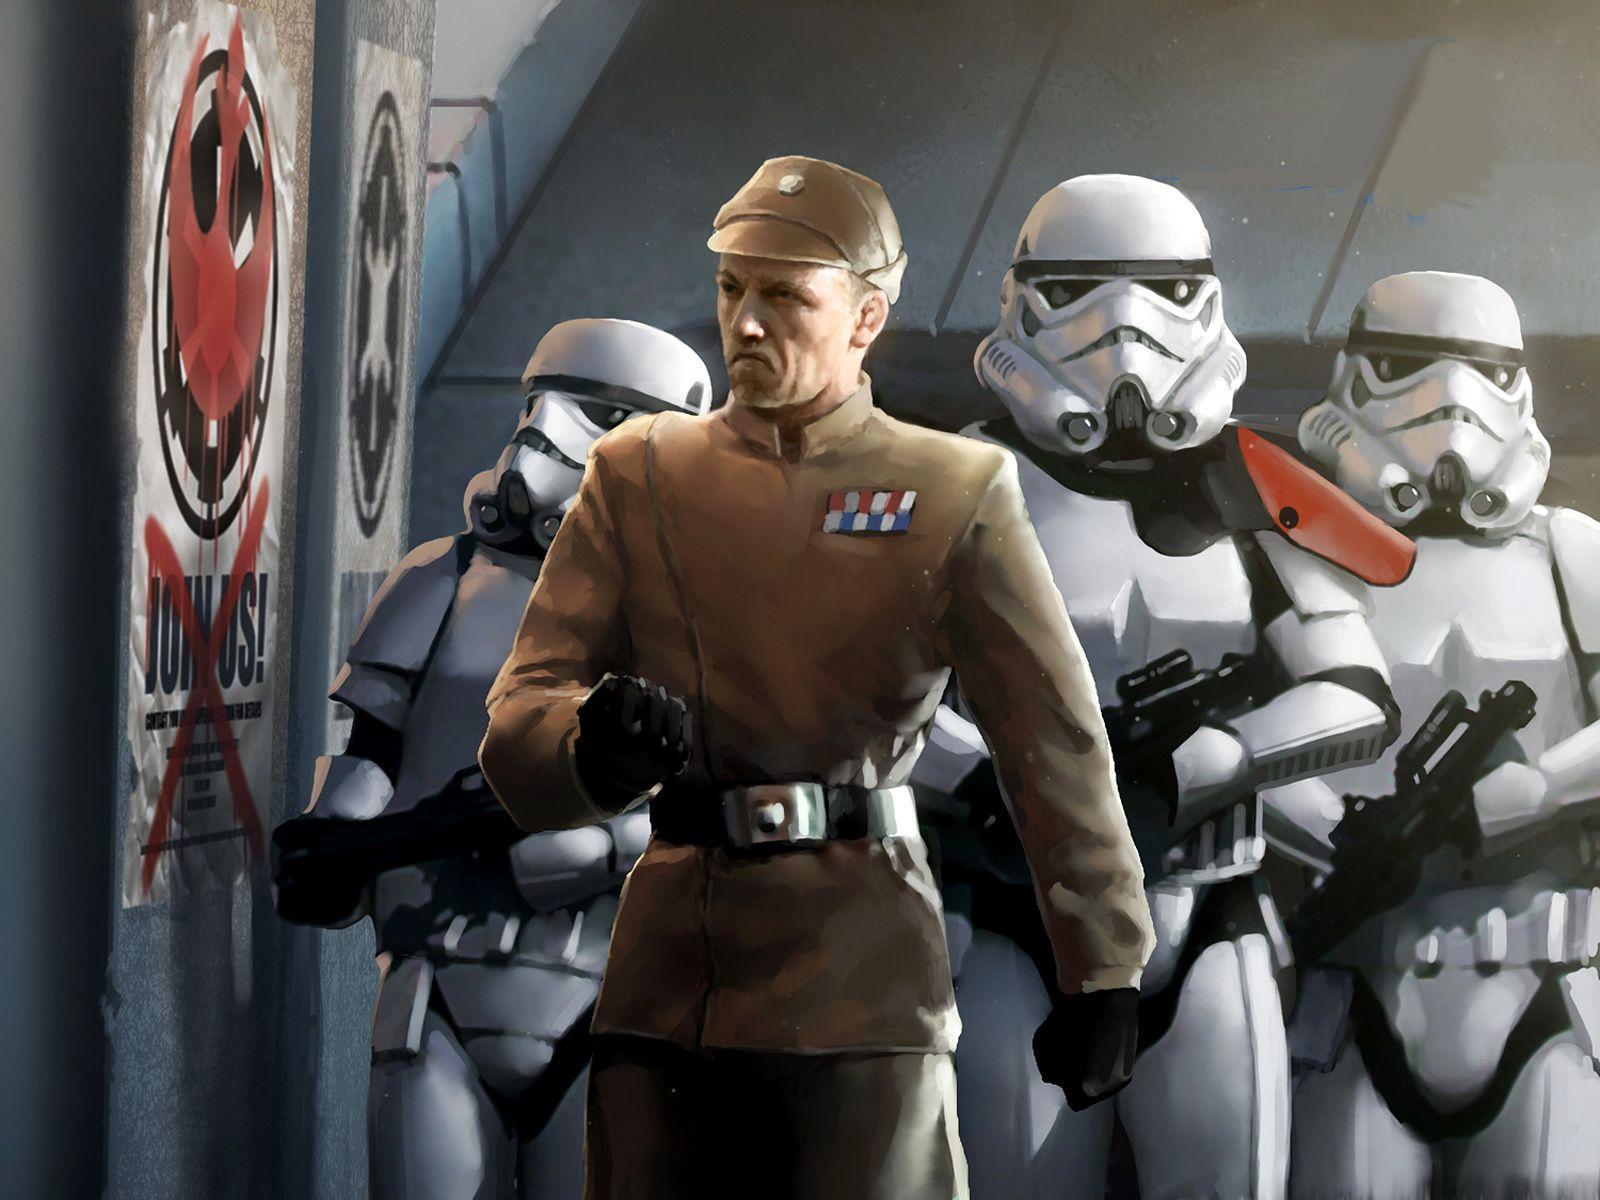 Star Wars Imperial Isb 1600x1200 Wallpaper Teahub Io